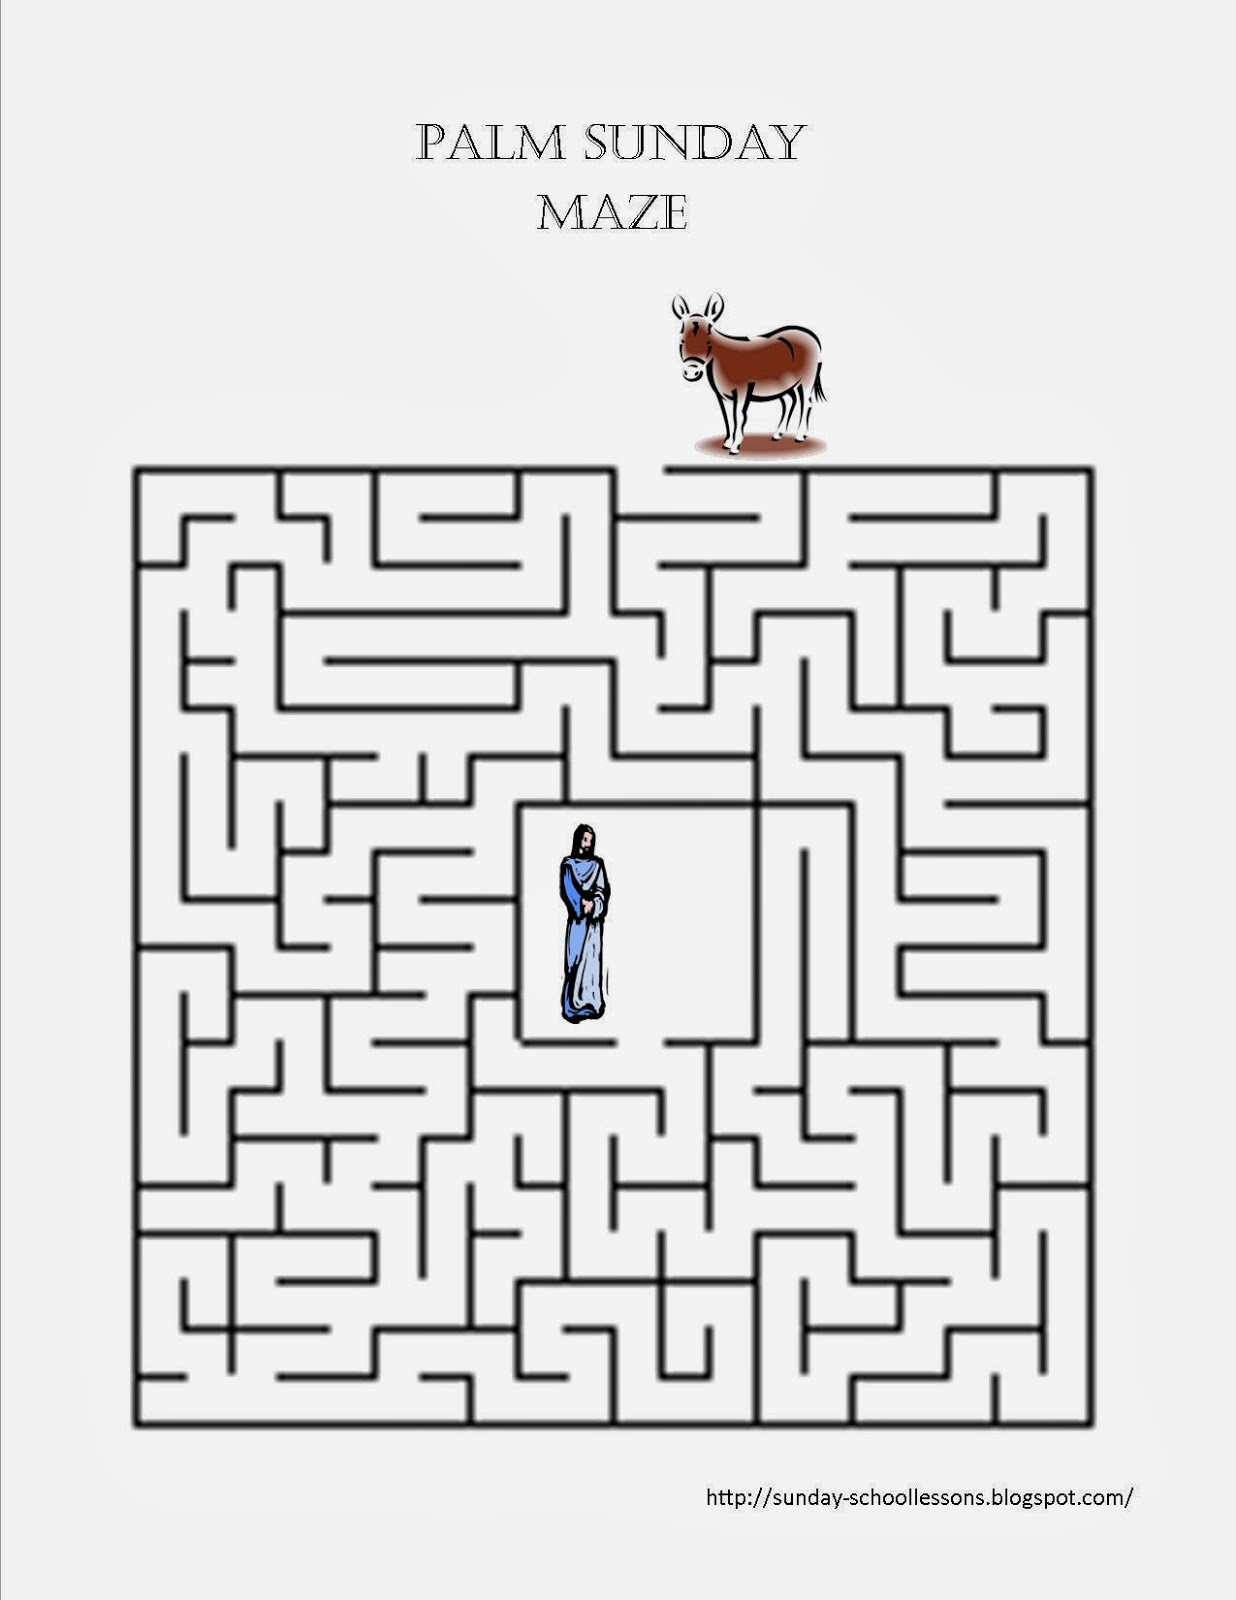 Maze clipart activity page #2